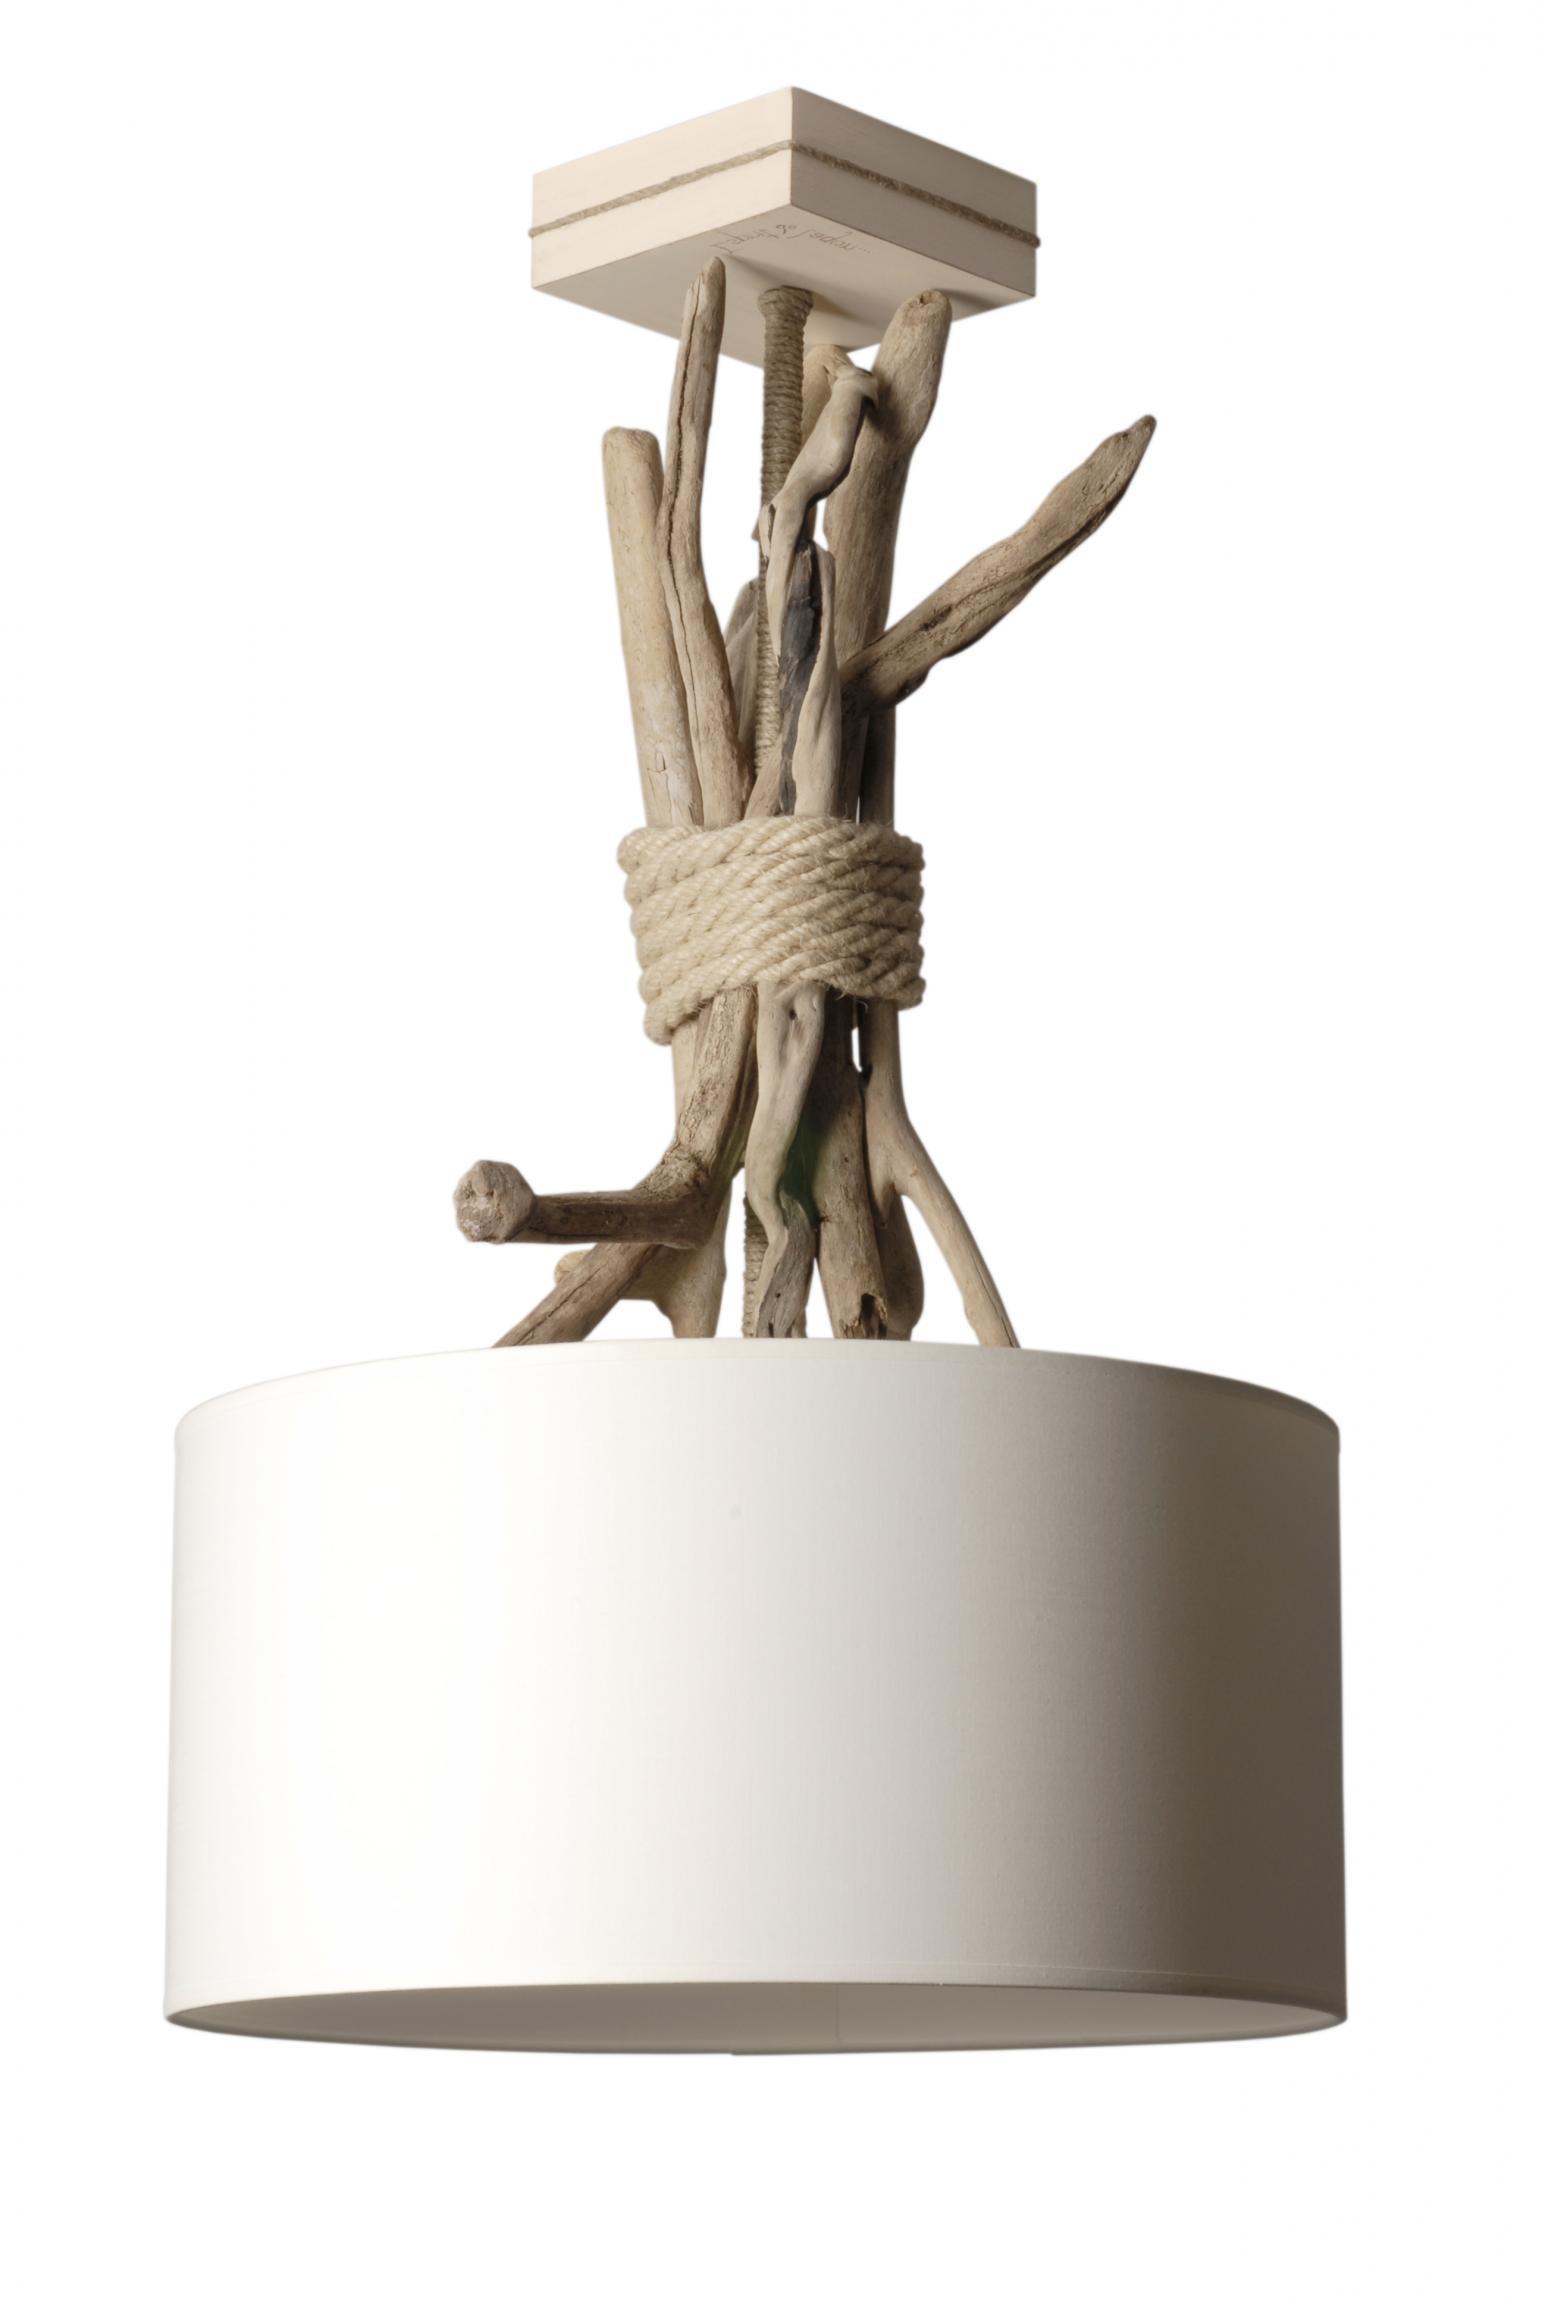 corinne breton coc 39 art cr ations cr ations. Black Bedroom Furniture Sets. Home Design Ideas